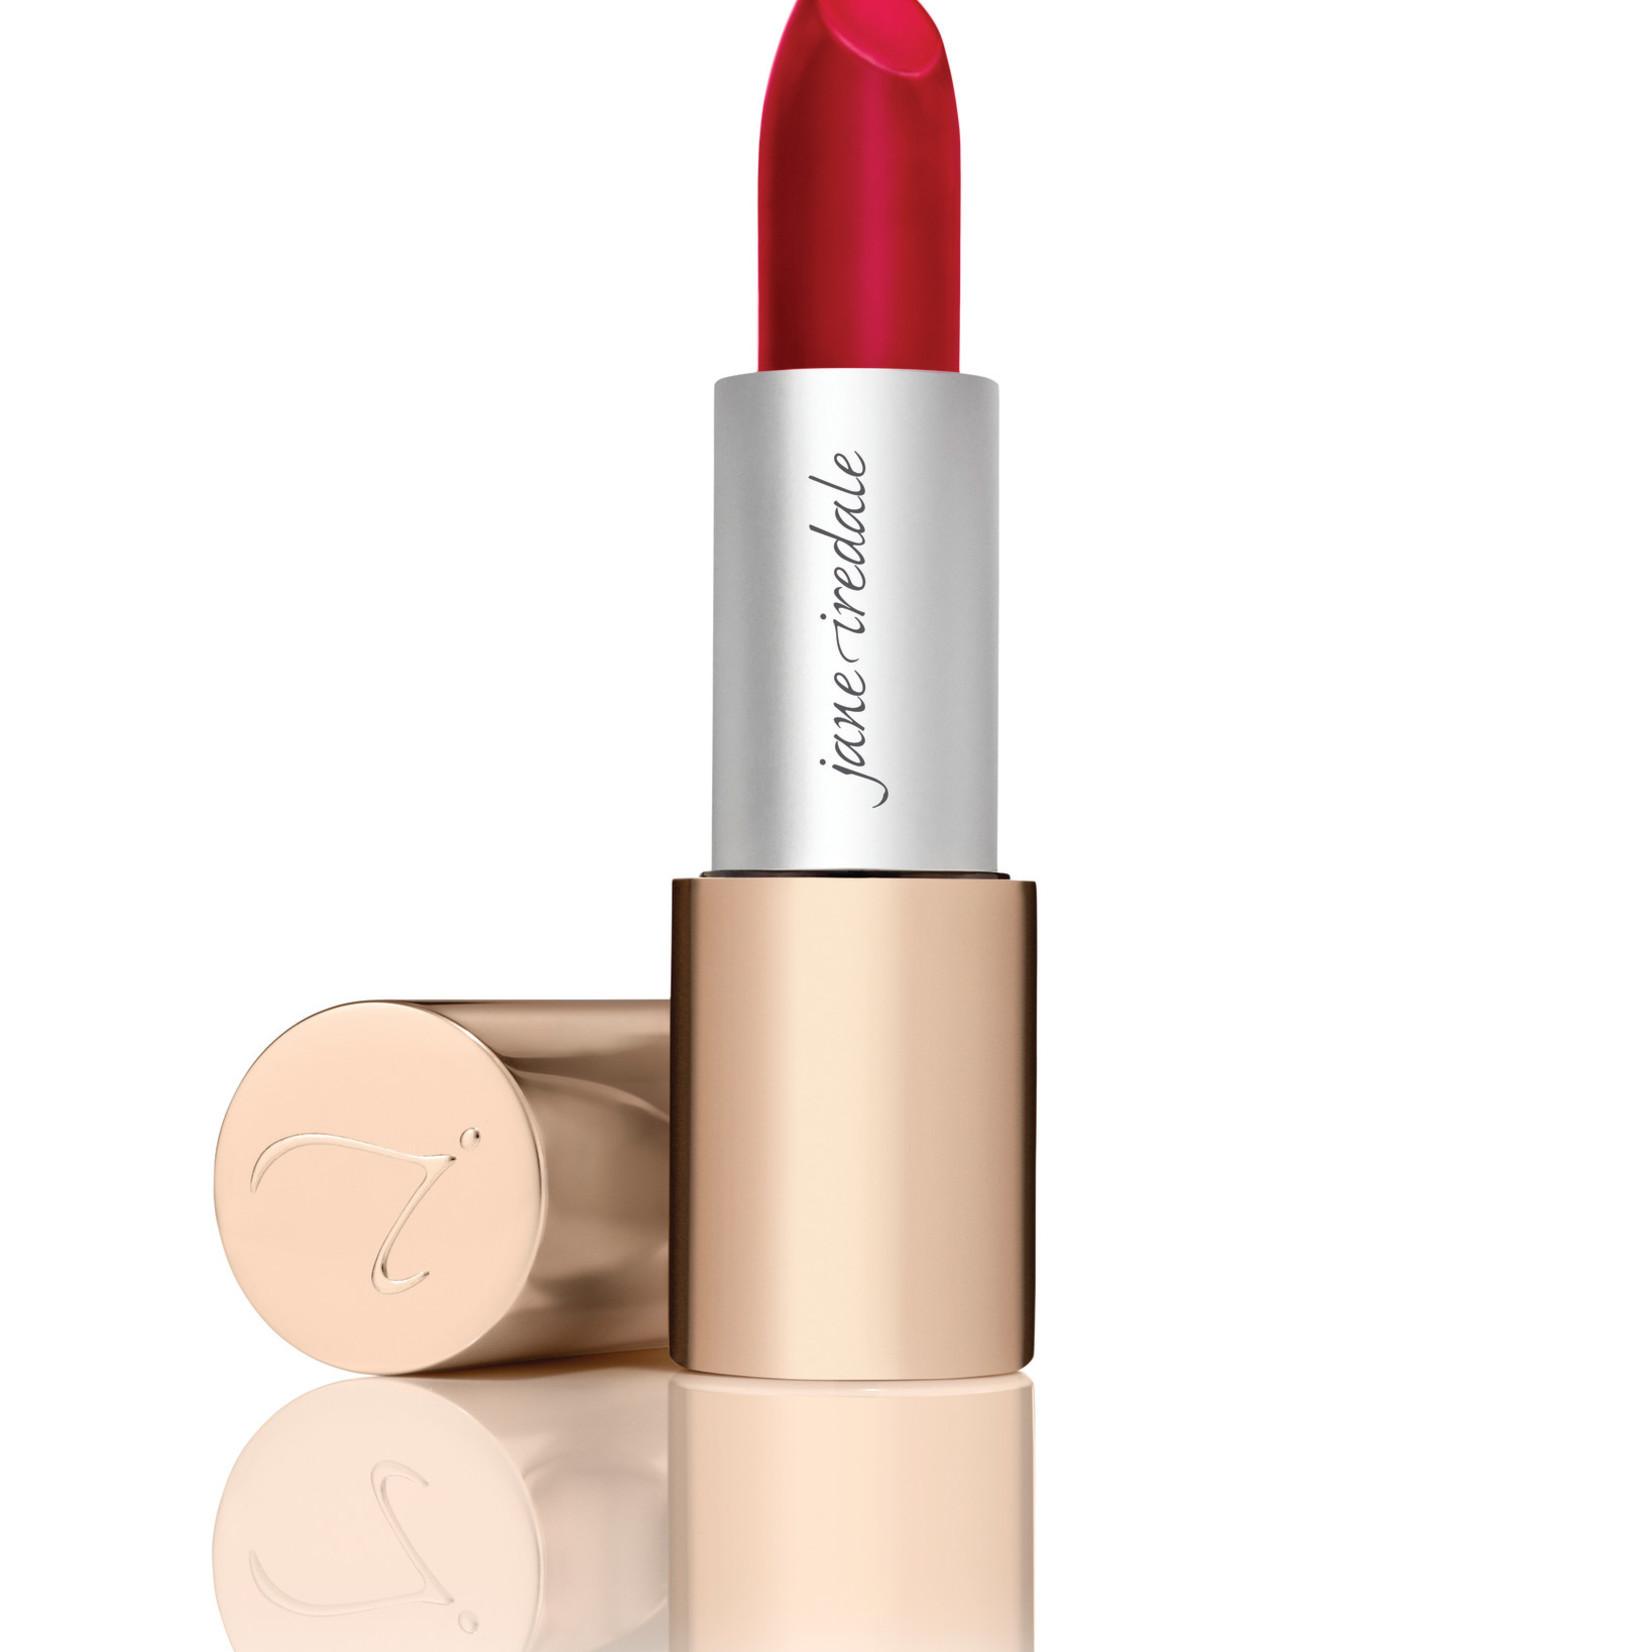 Jane Iredale Triple Luxe Long Lasting Naturally Moist Lipstick™